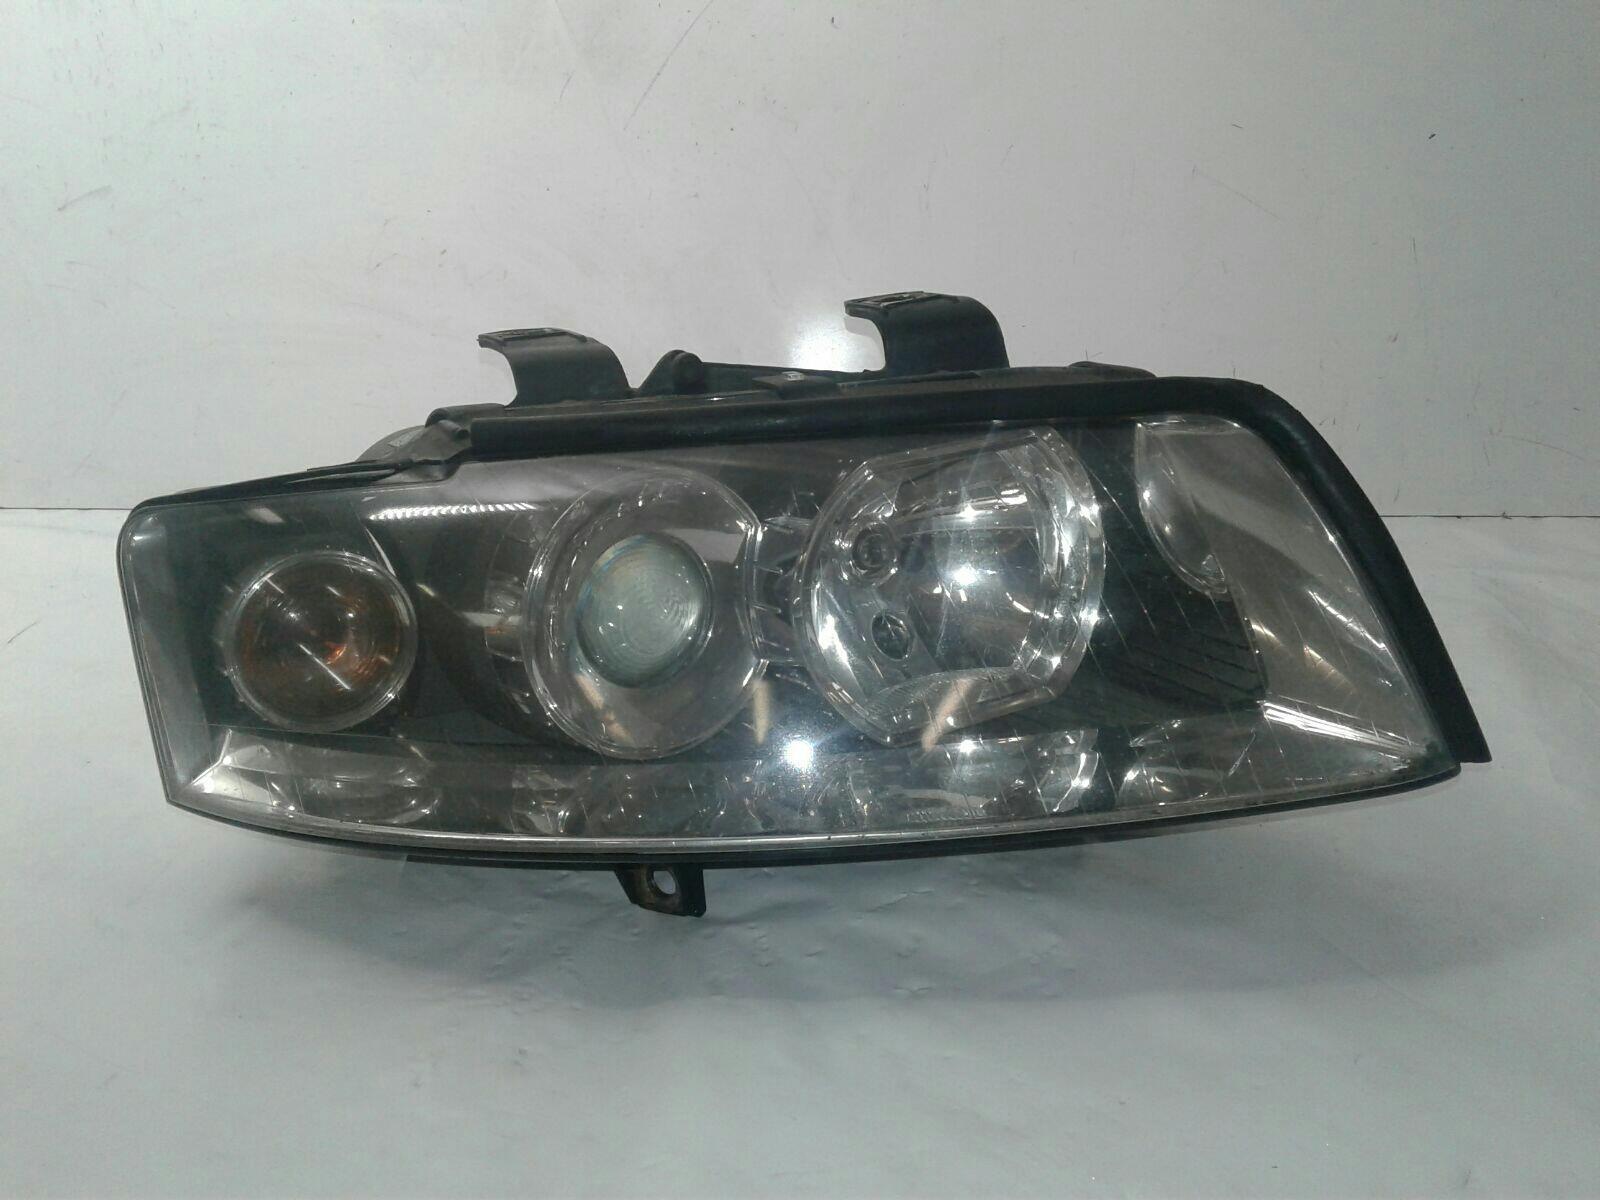 HEADLIGHT Audi A4 2001 To 2005 DRIVERS SIDE Headlamp & WARRANTY - 7343026